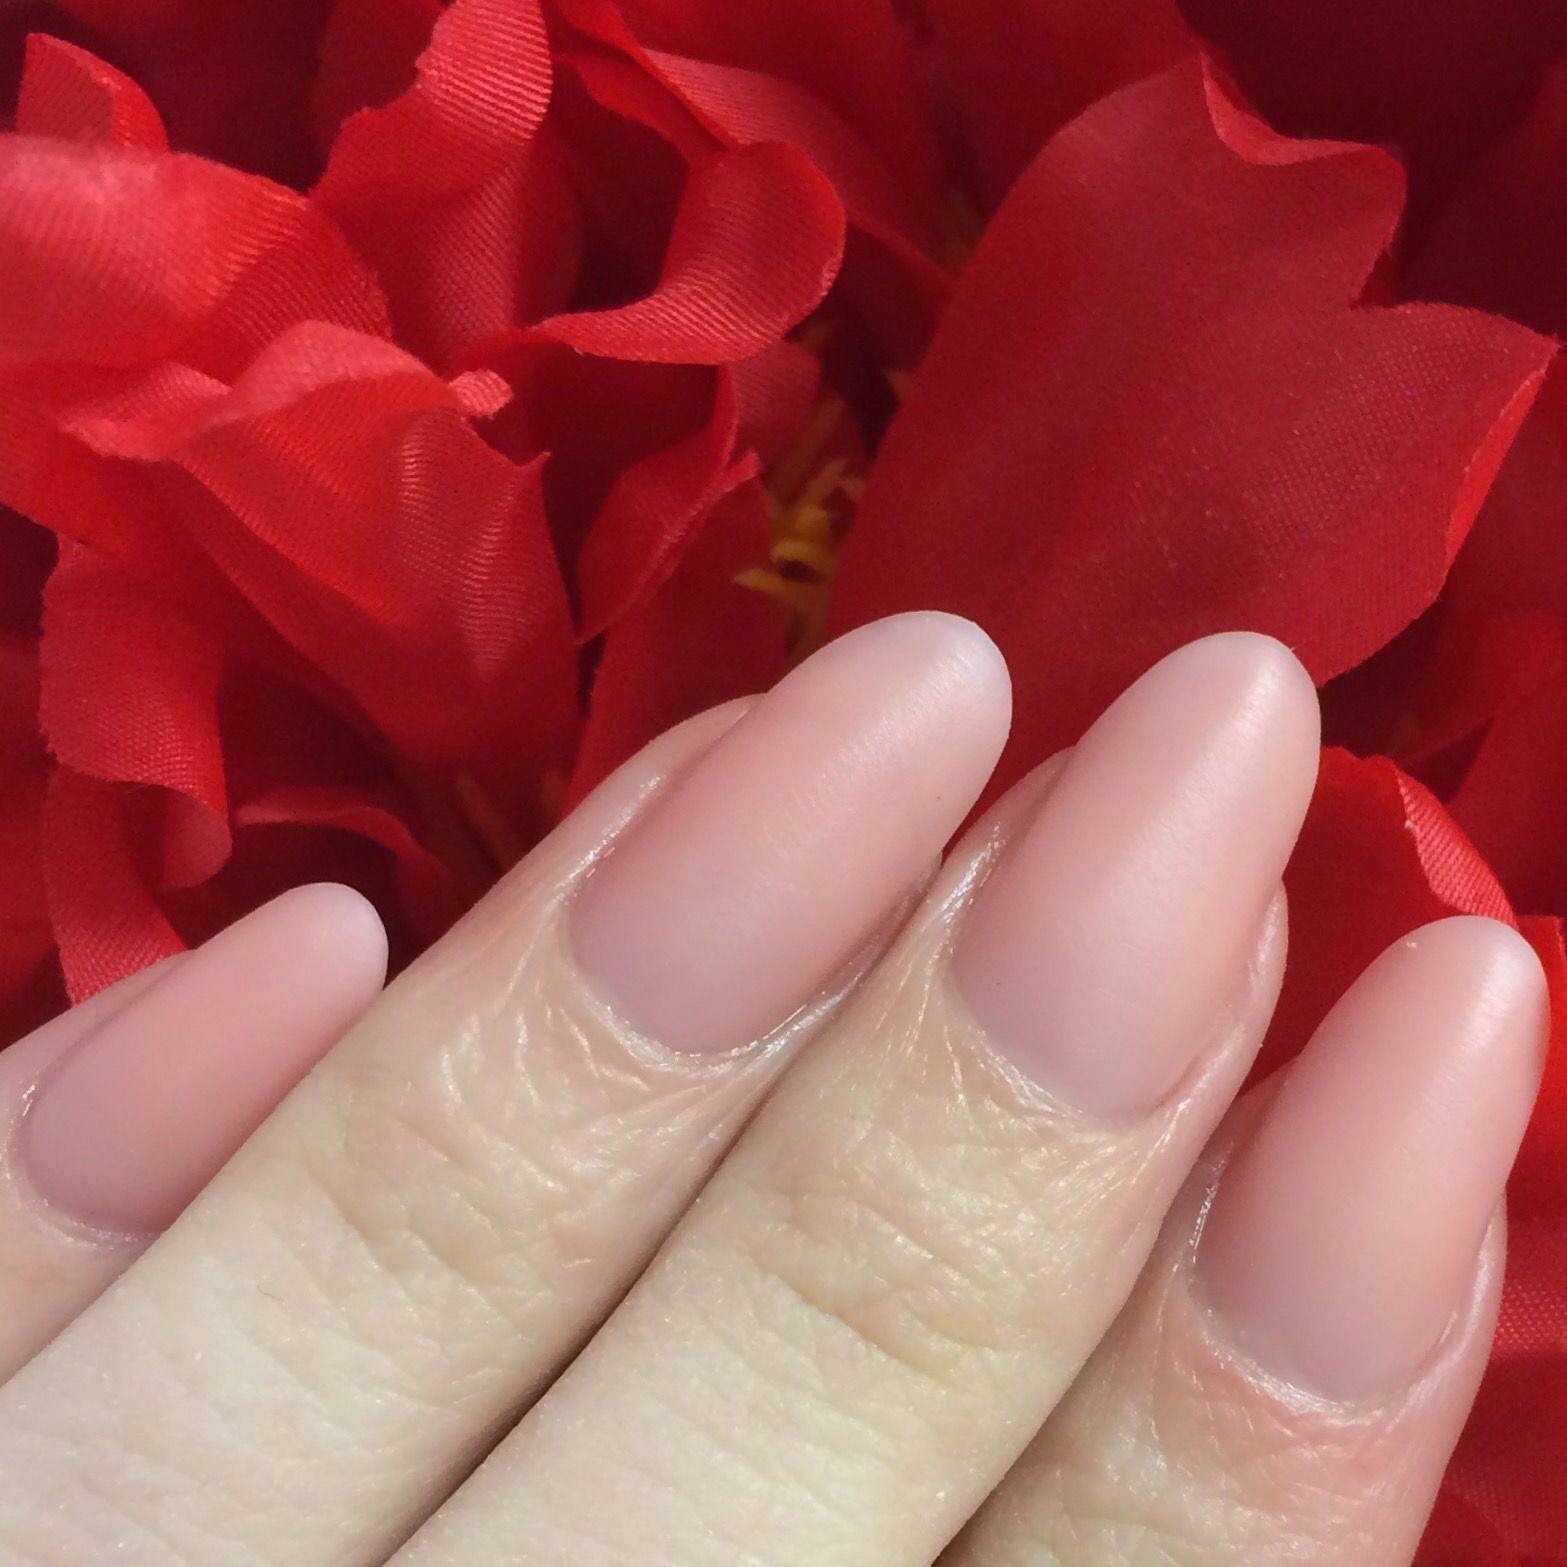 Polygel Nail Extension Kit Stallberry Nailtutorials Builder Gel Nails Polygel Nails Gel Nail Extensions